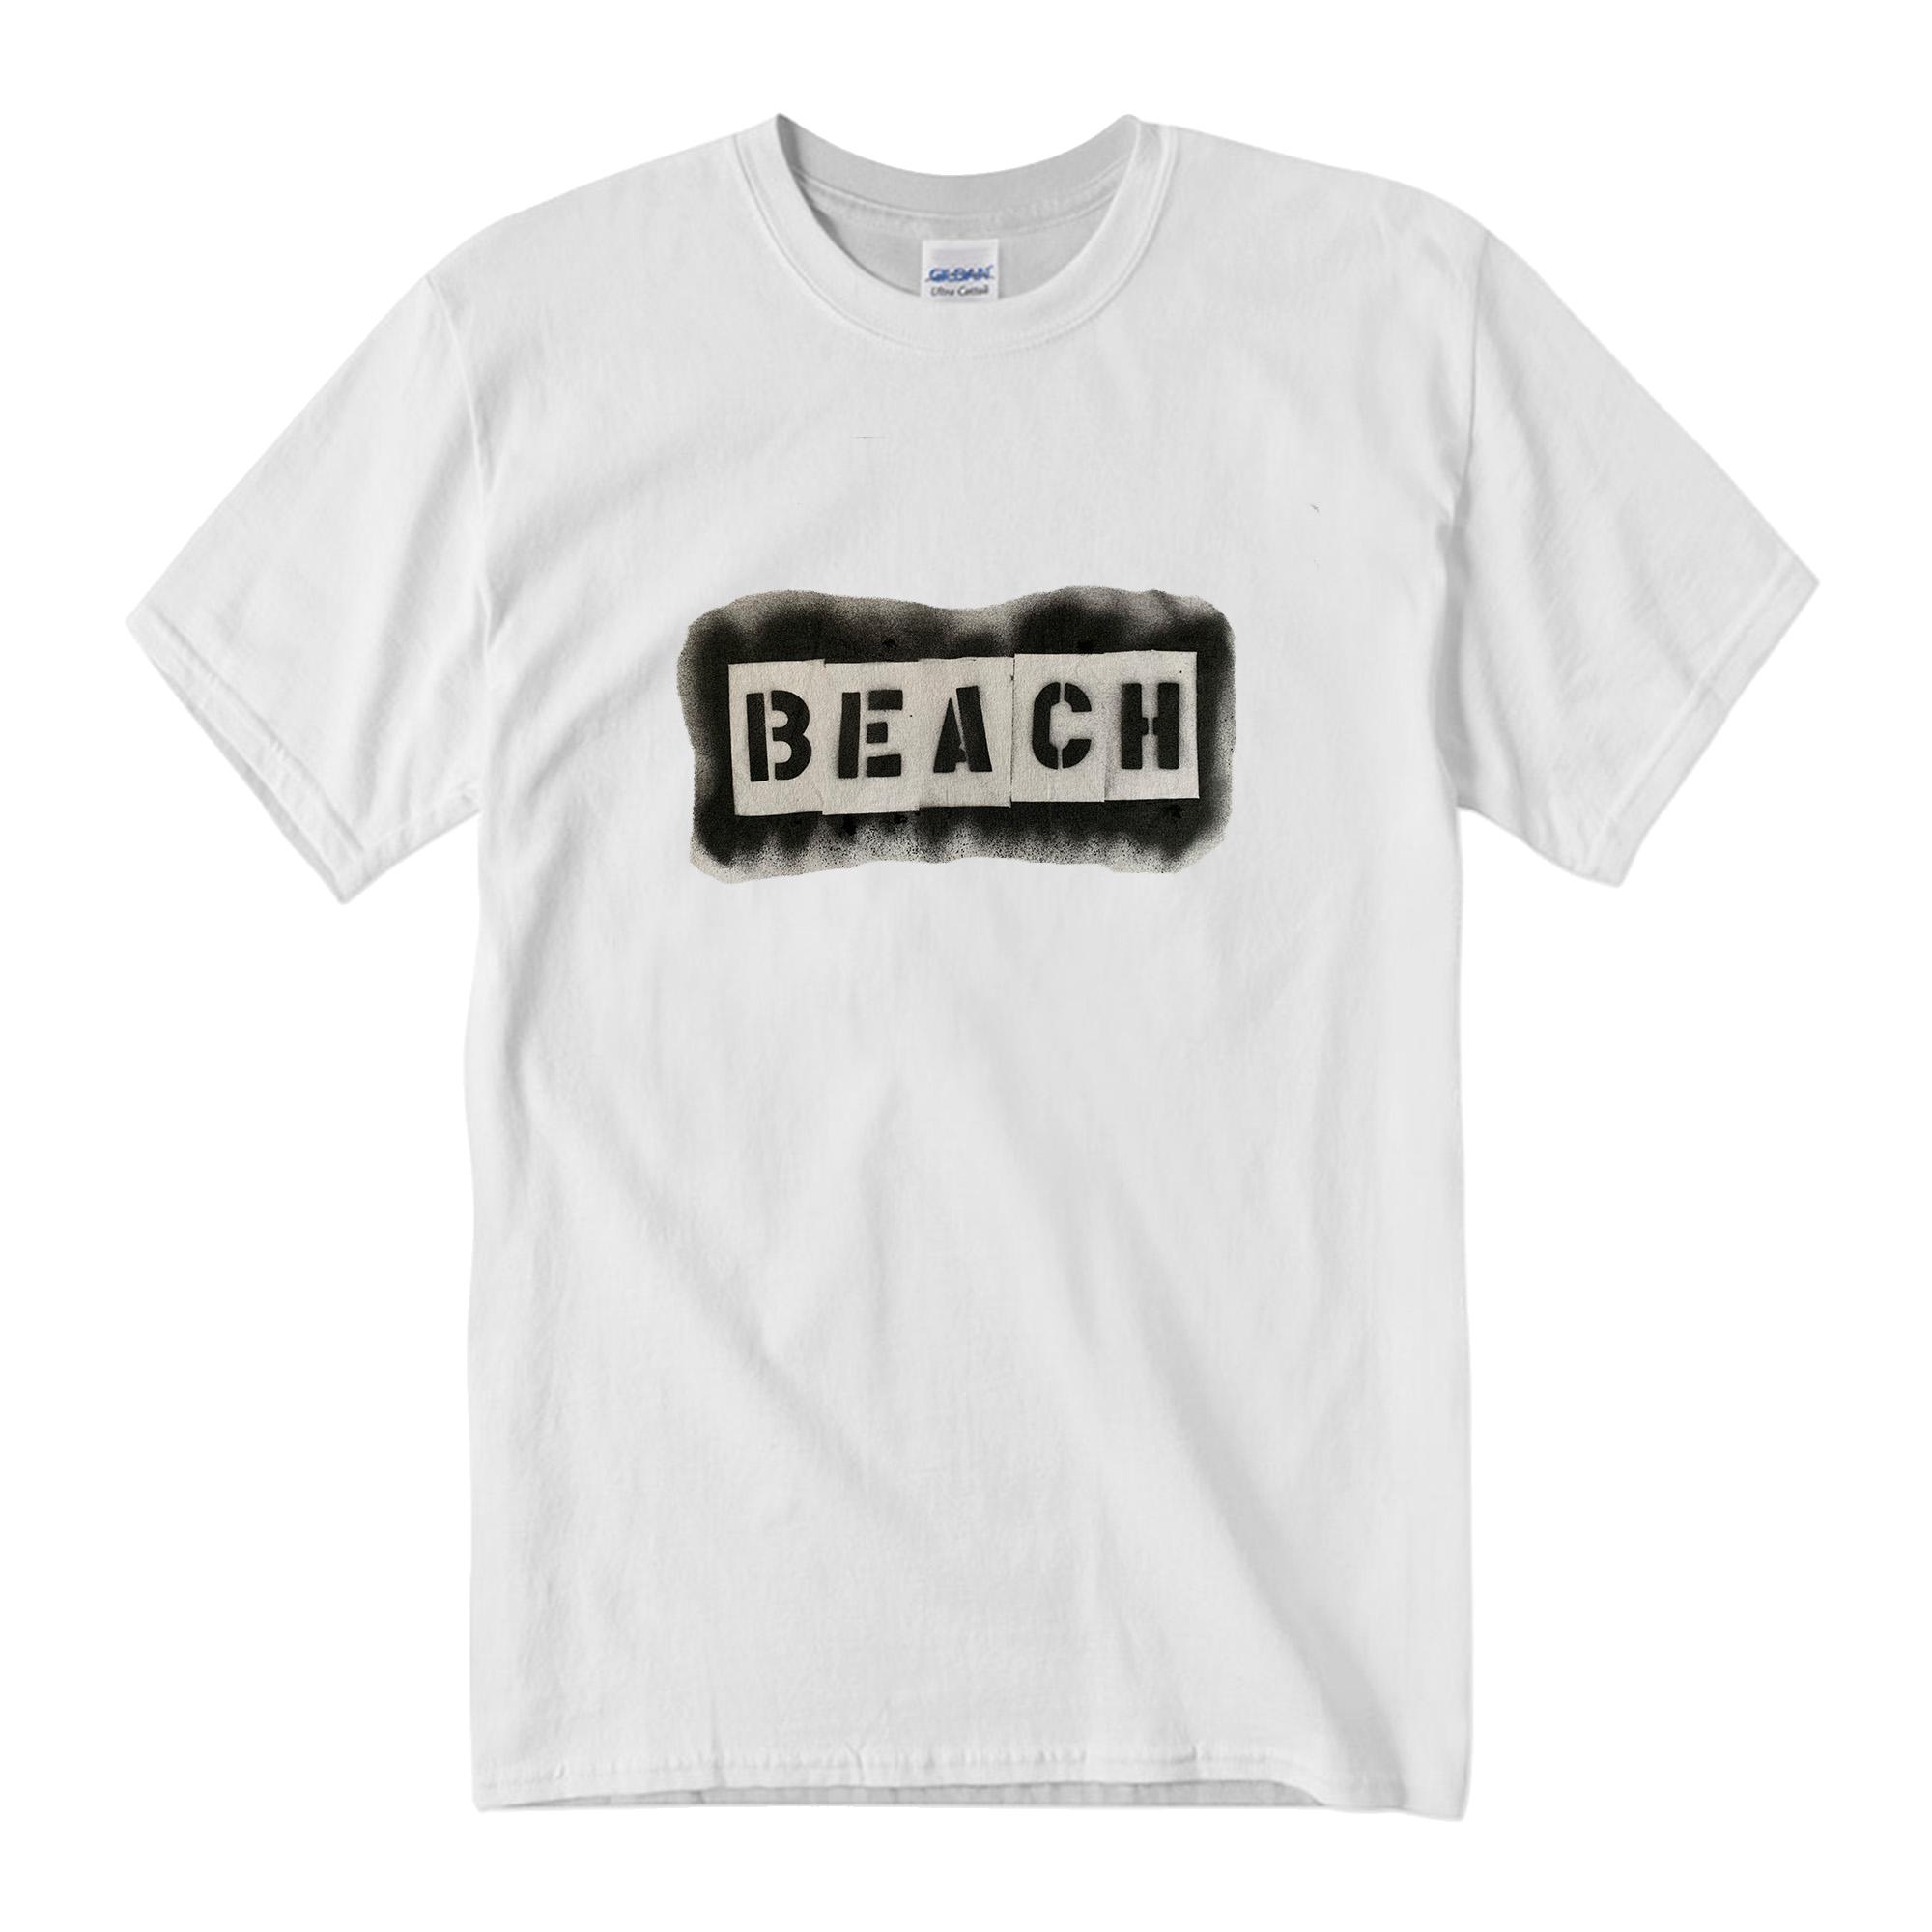 T-Shirt Video Lyric Shirt